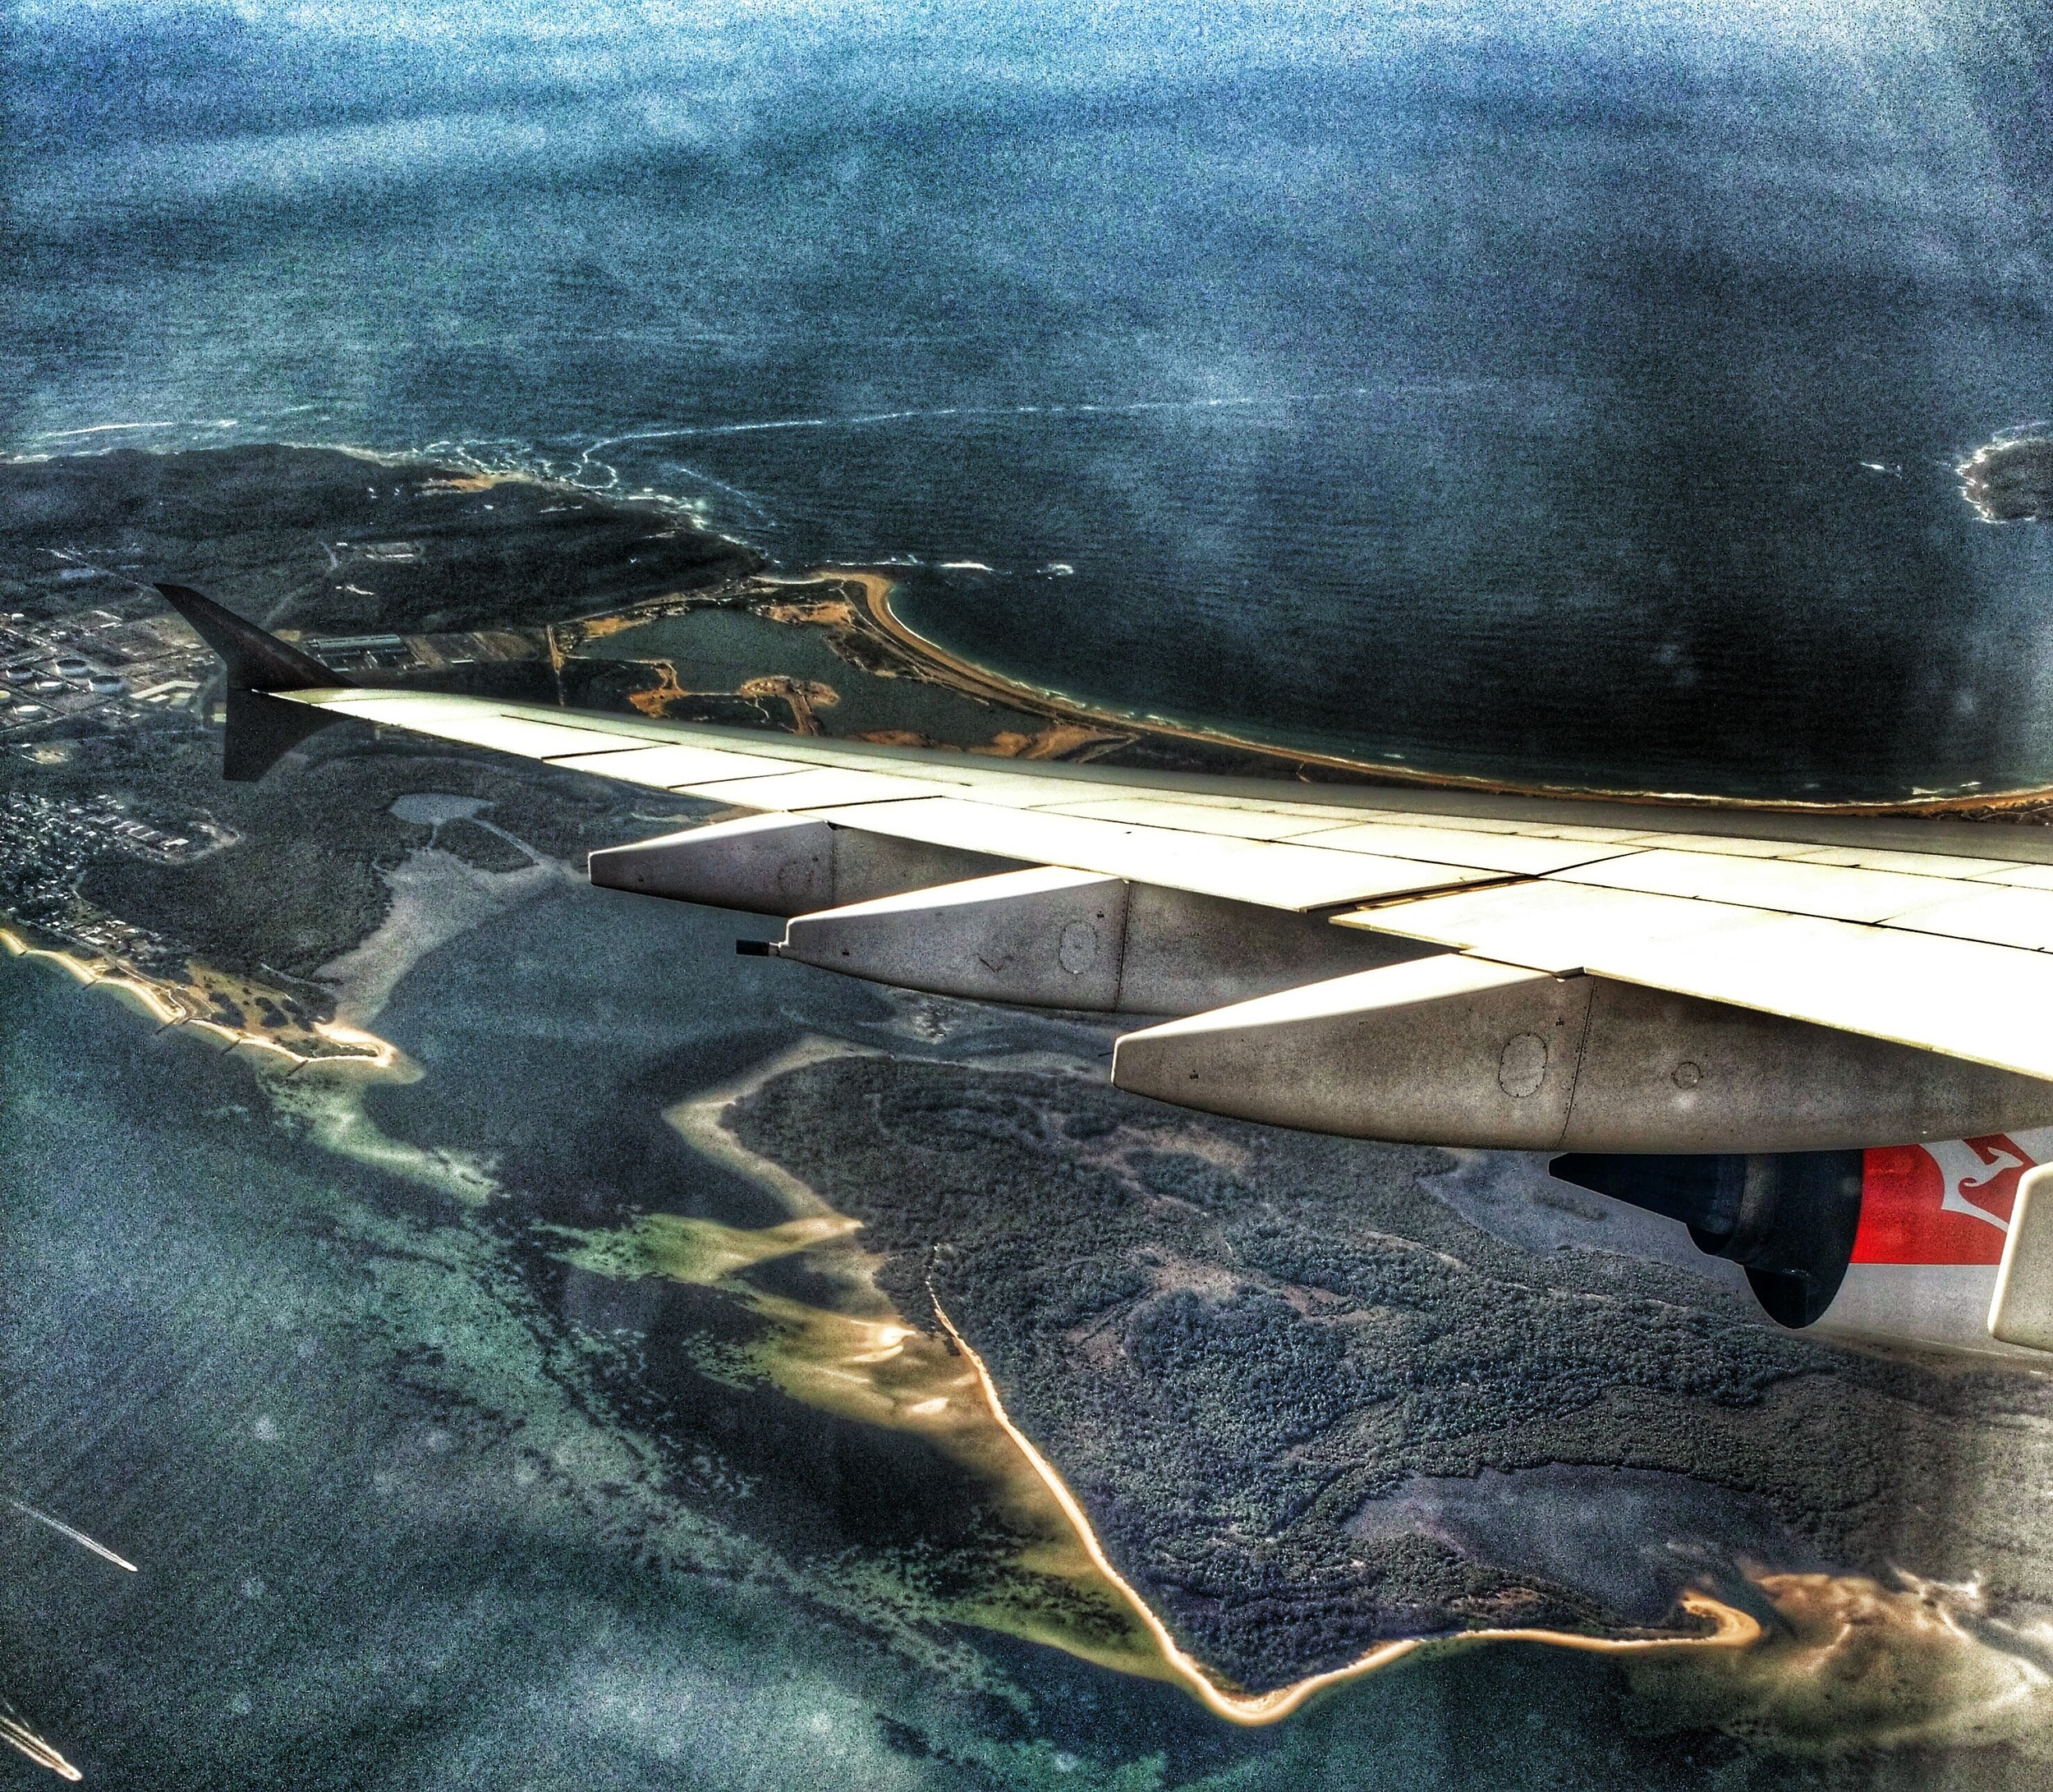 Landing in Sydney